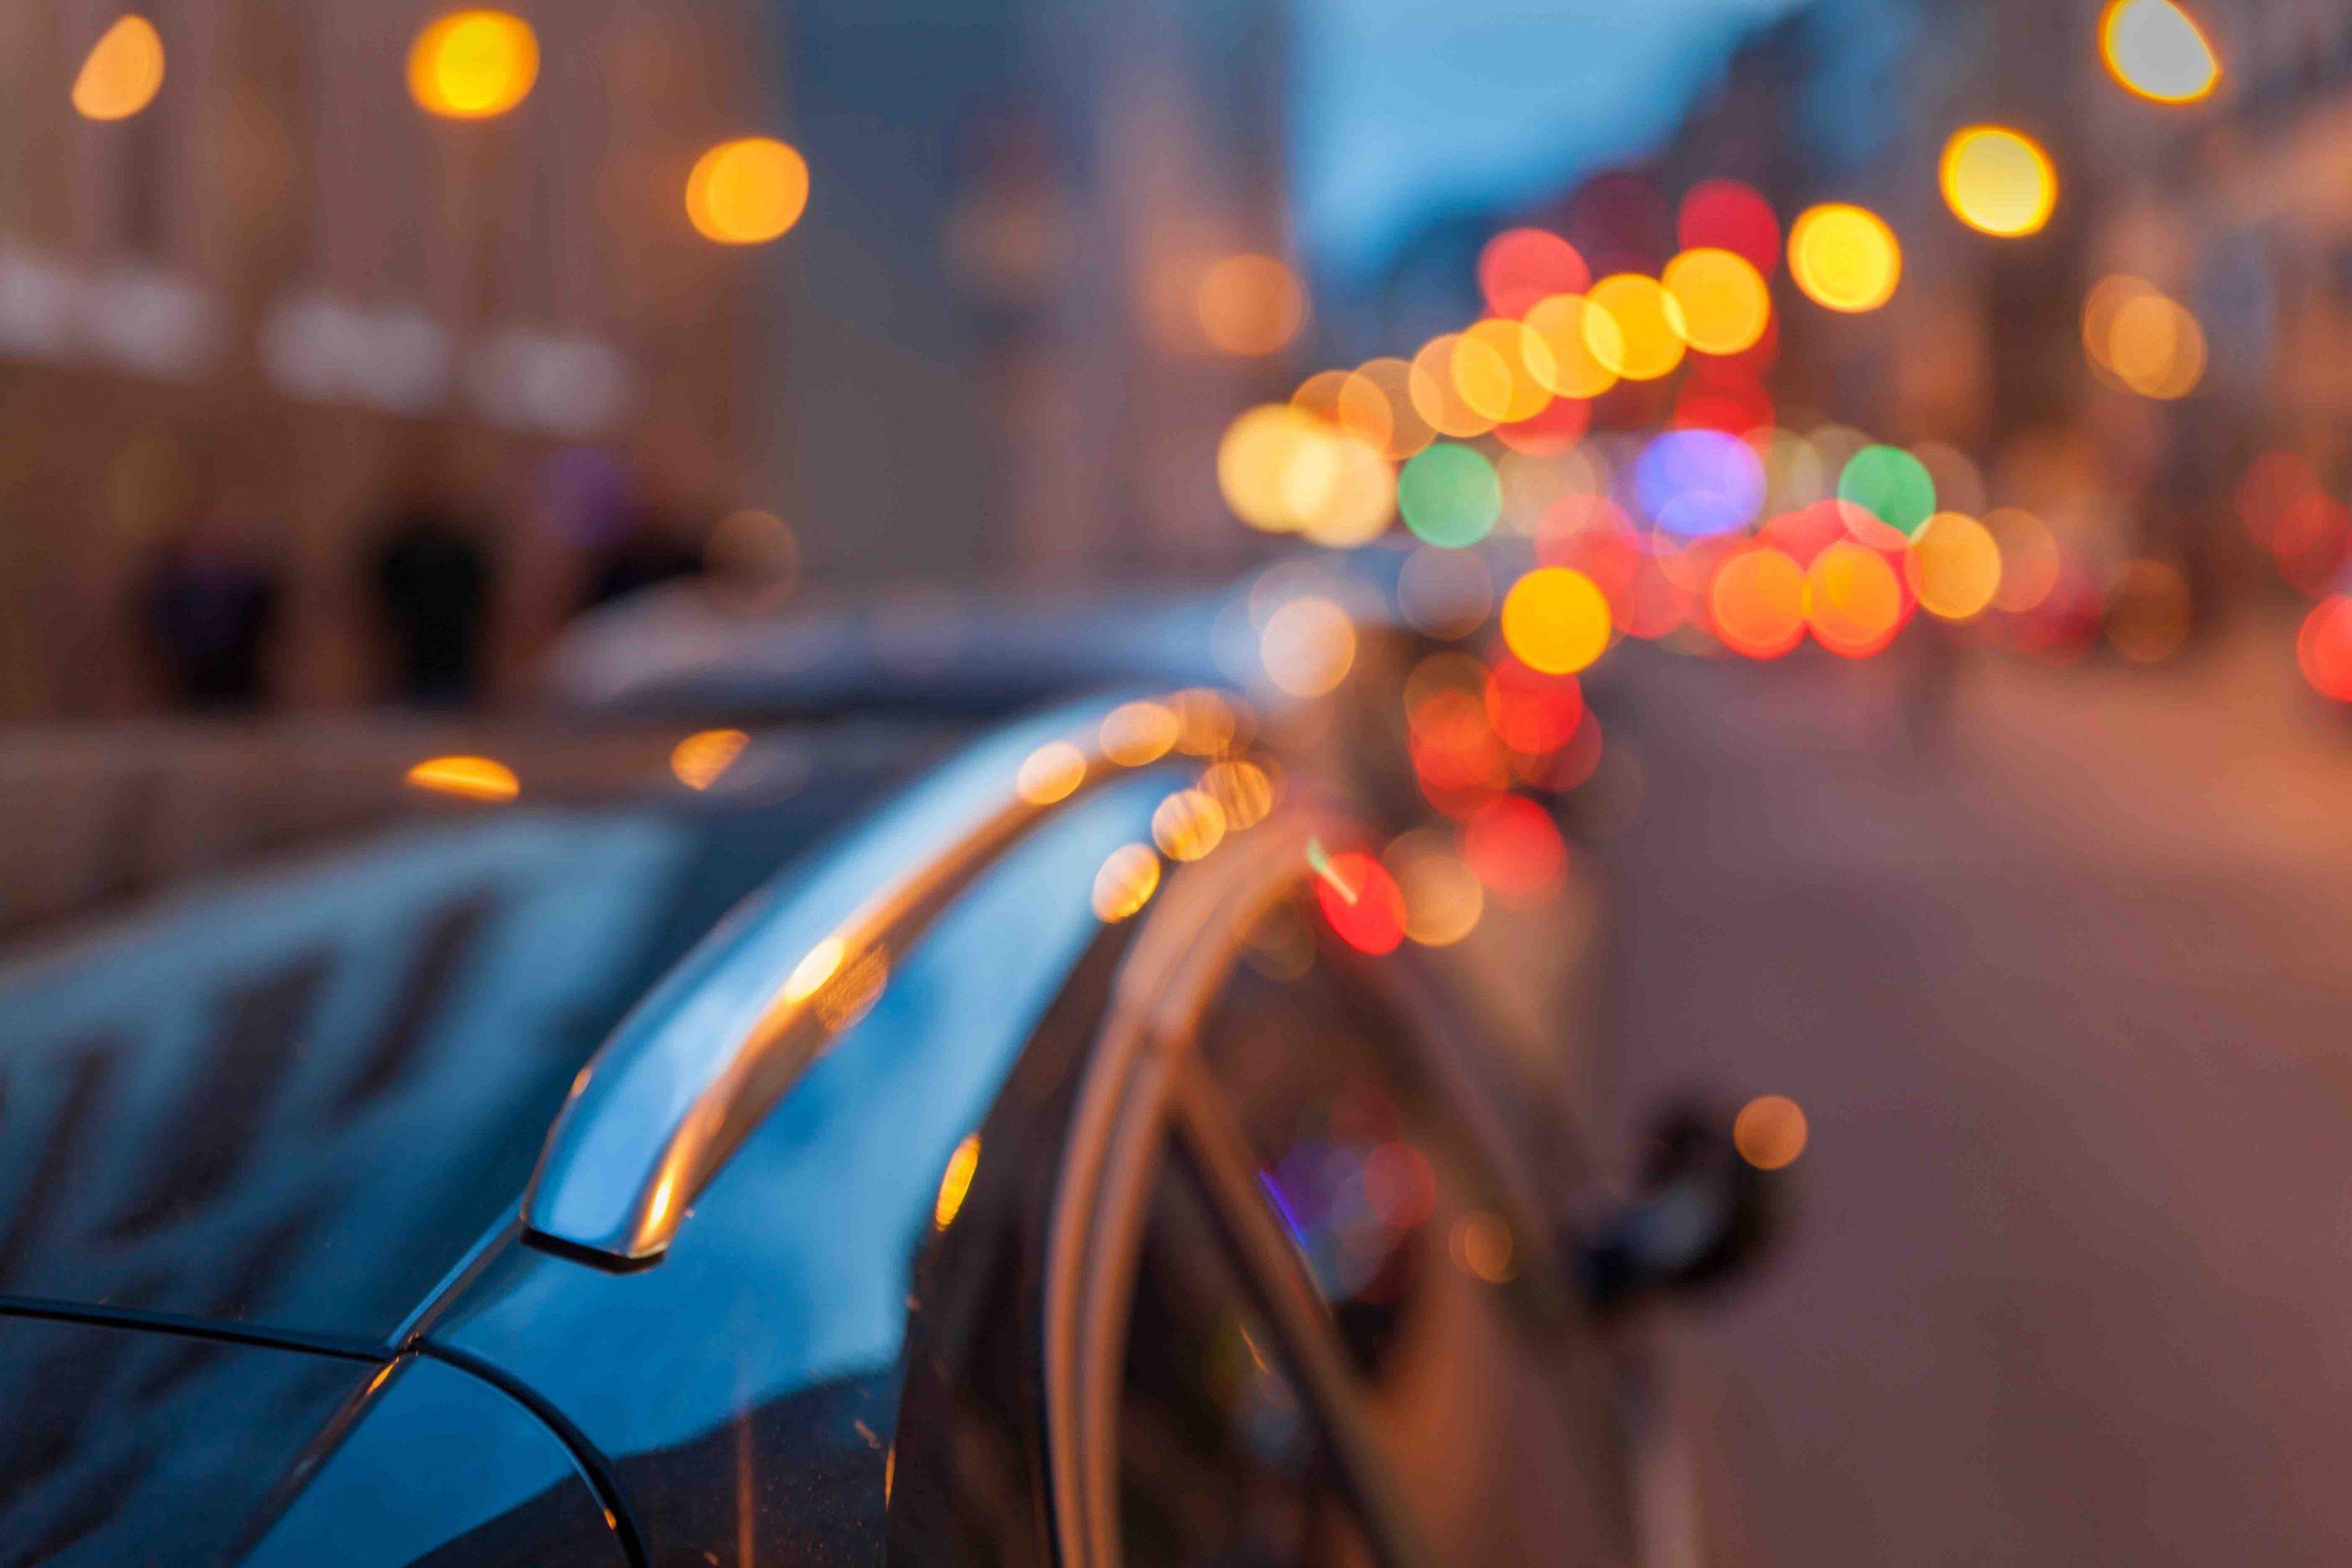 street-lights-7MTNULZ